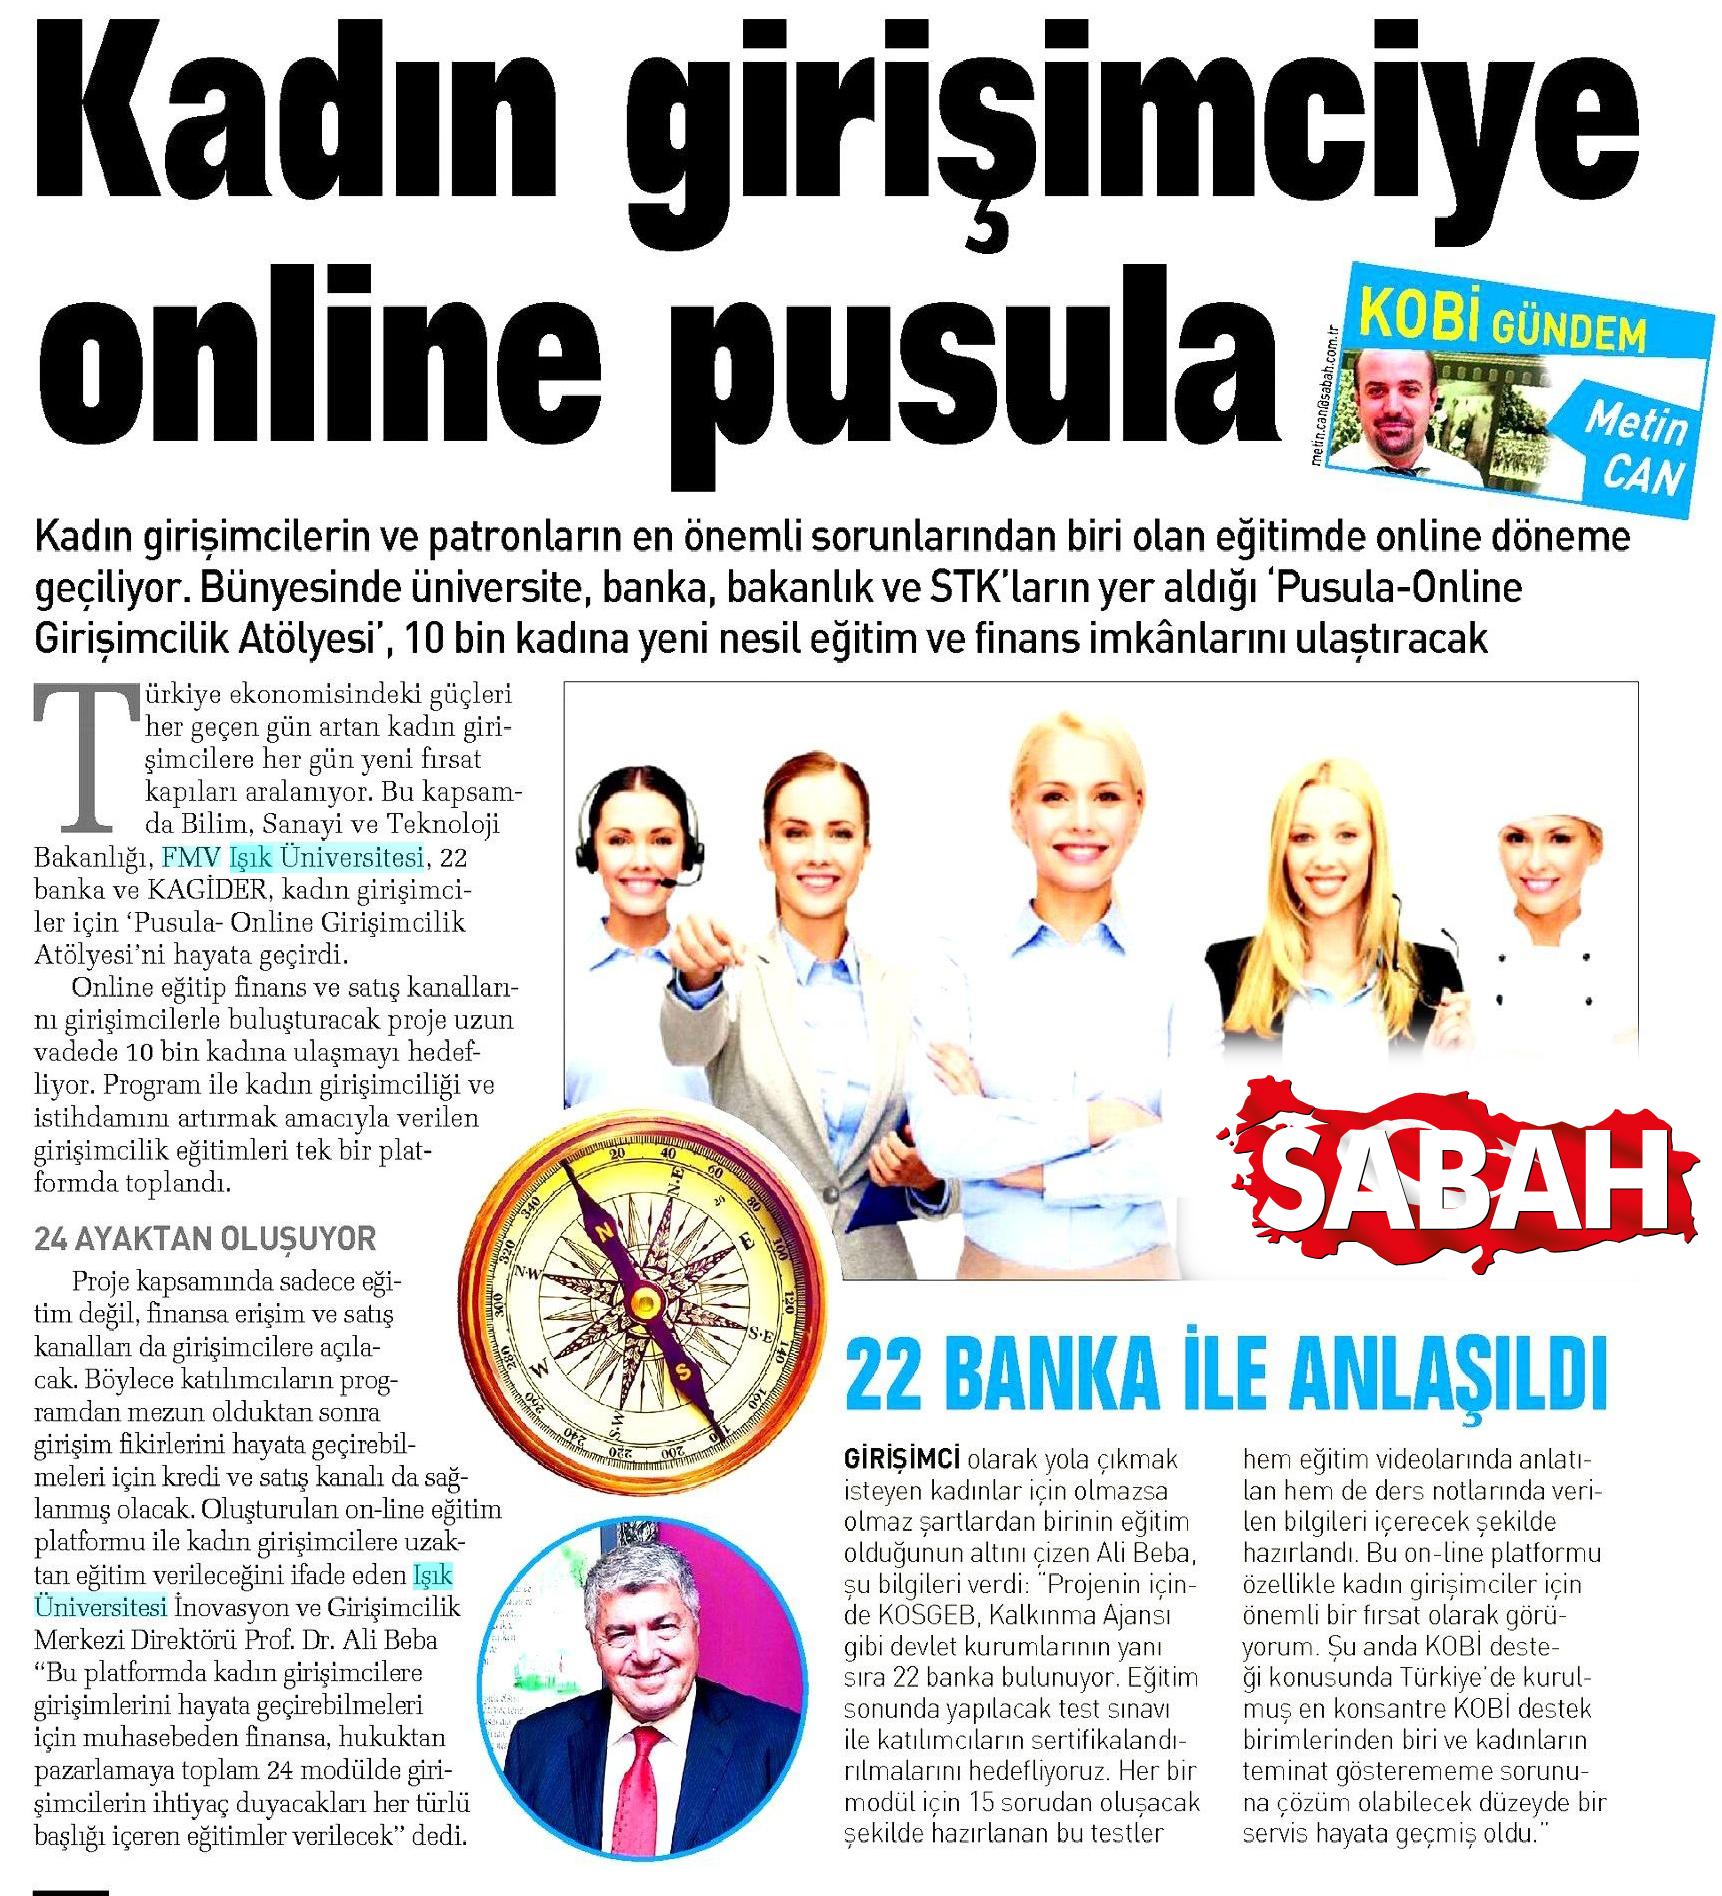 sabah-kadin_girisimciye_online_pusula-1